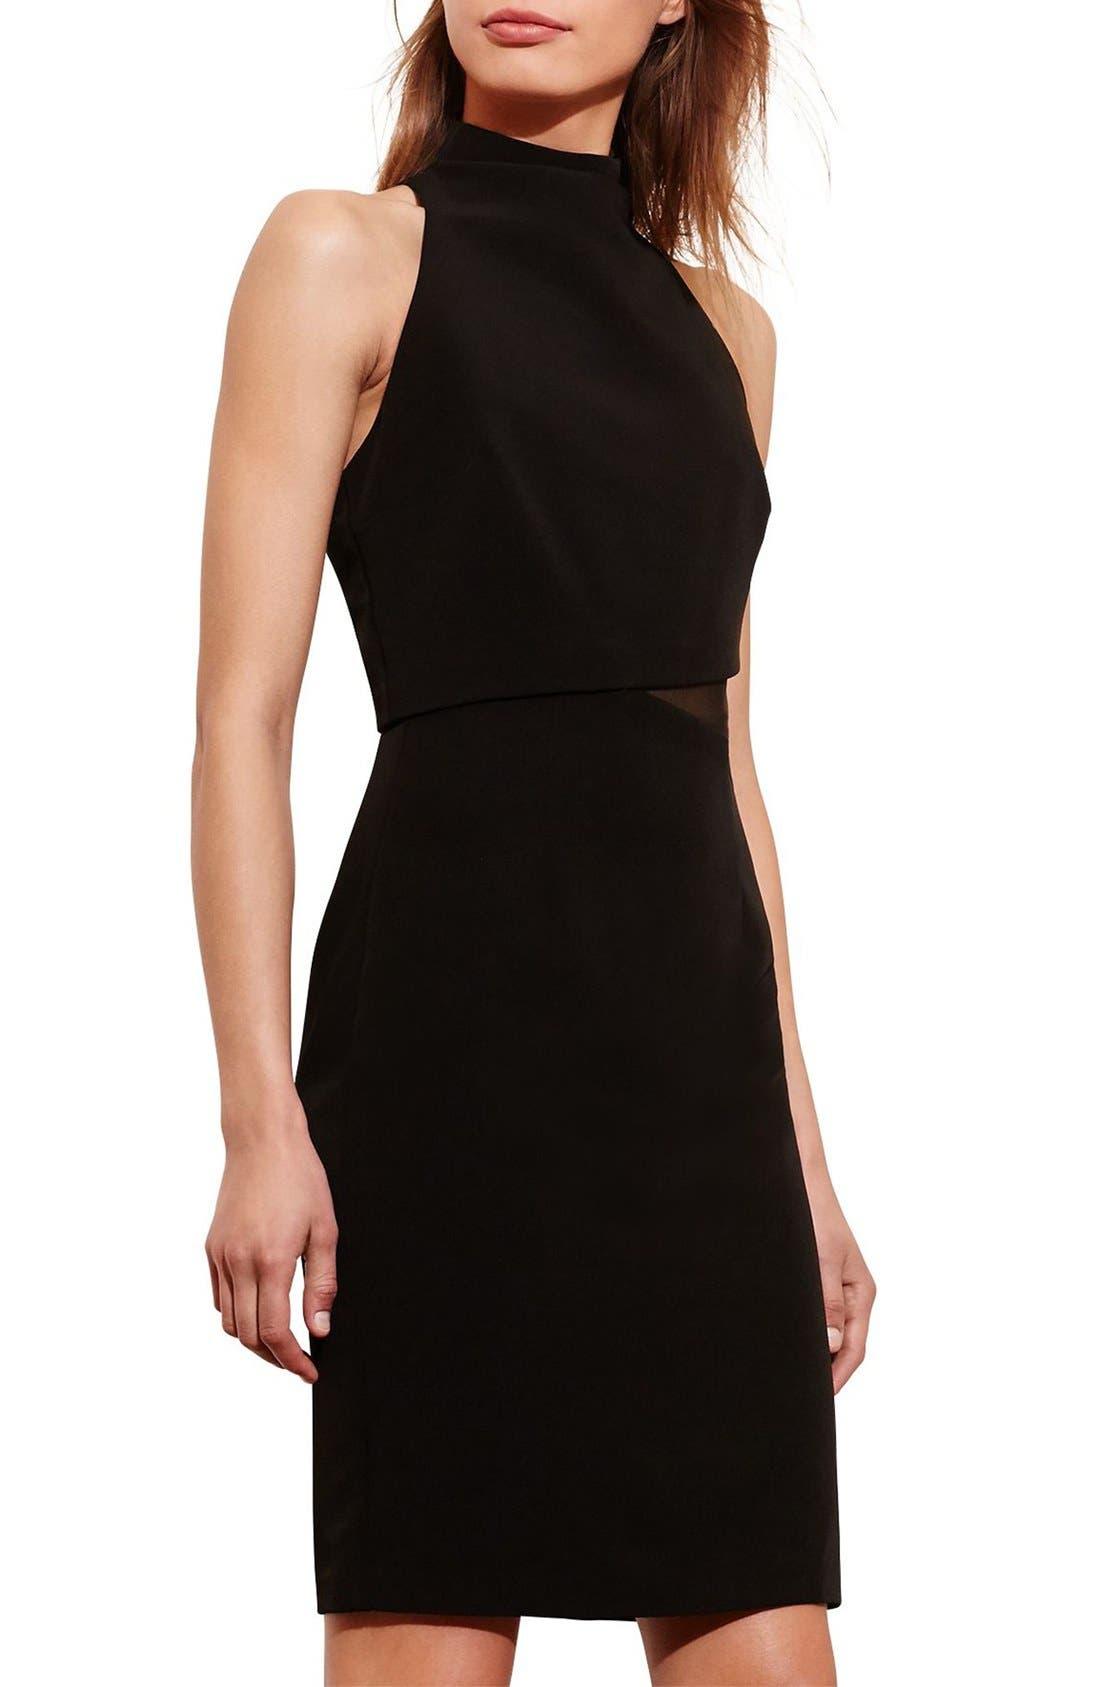 Alternate Image 1 Selected - Lauren Ralph Lauren Asymmetrical Stretch Sheath Dress